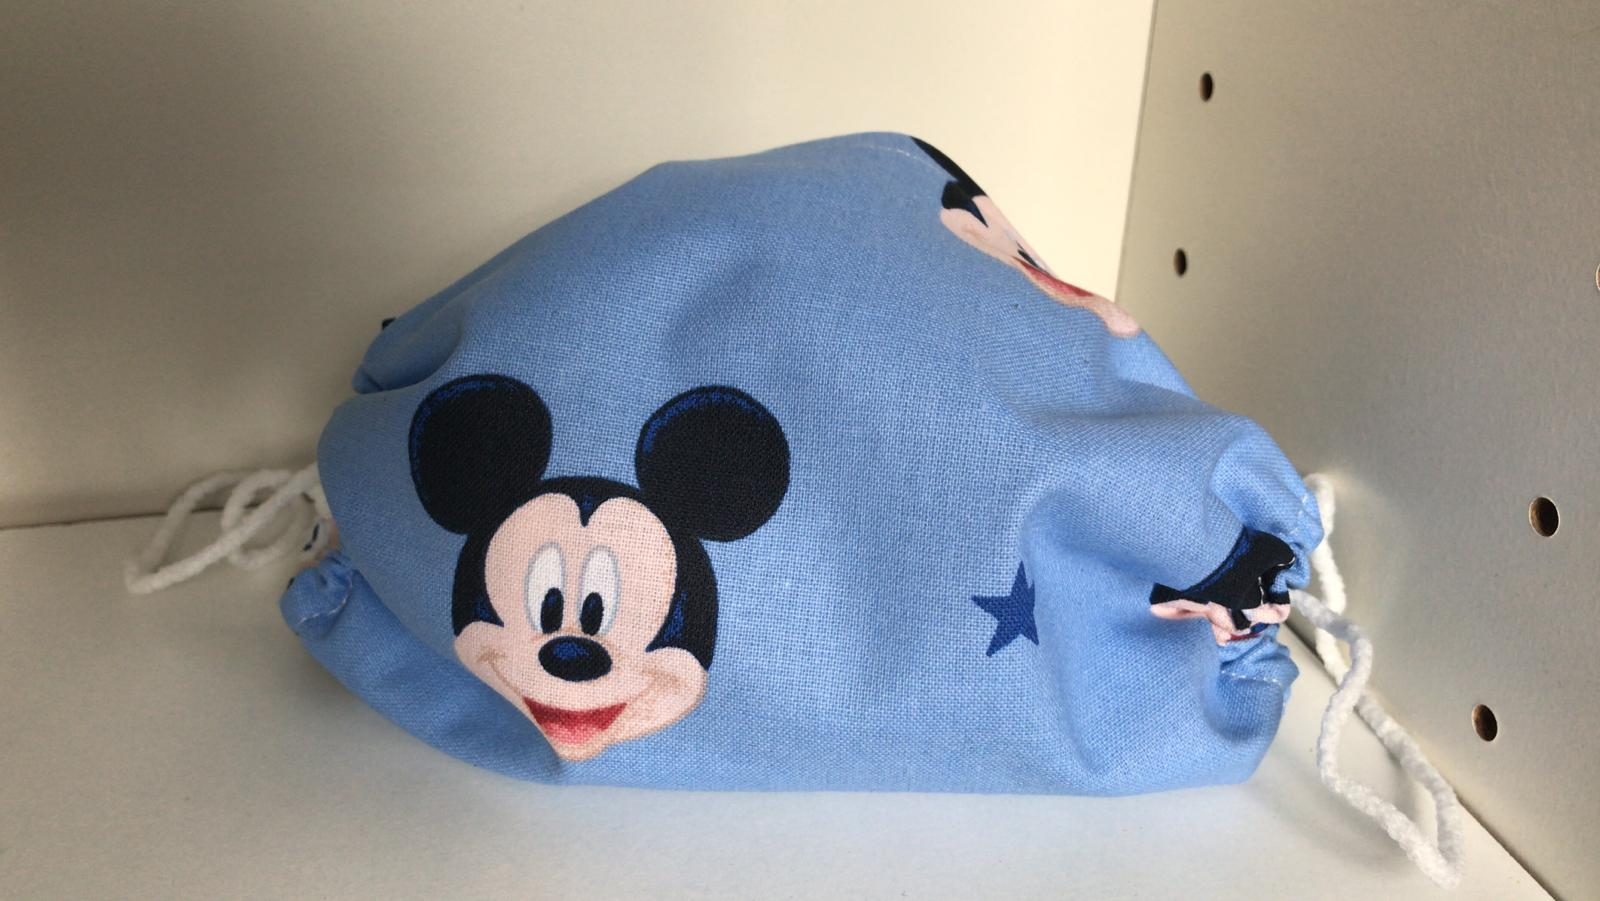 Gesichtsmasken – Limitiert Micky in Blau